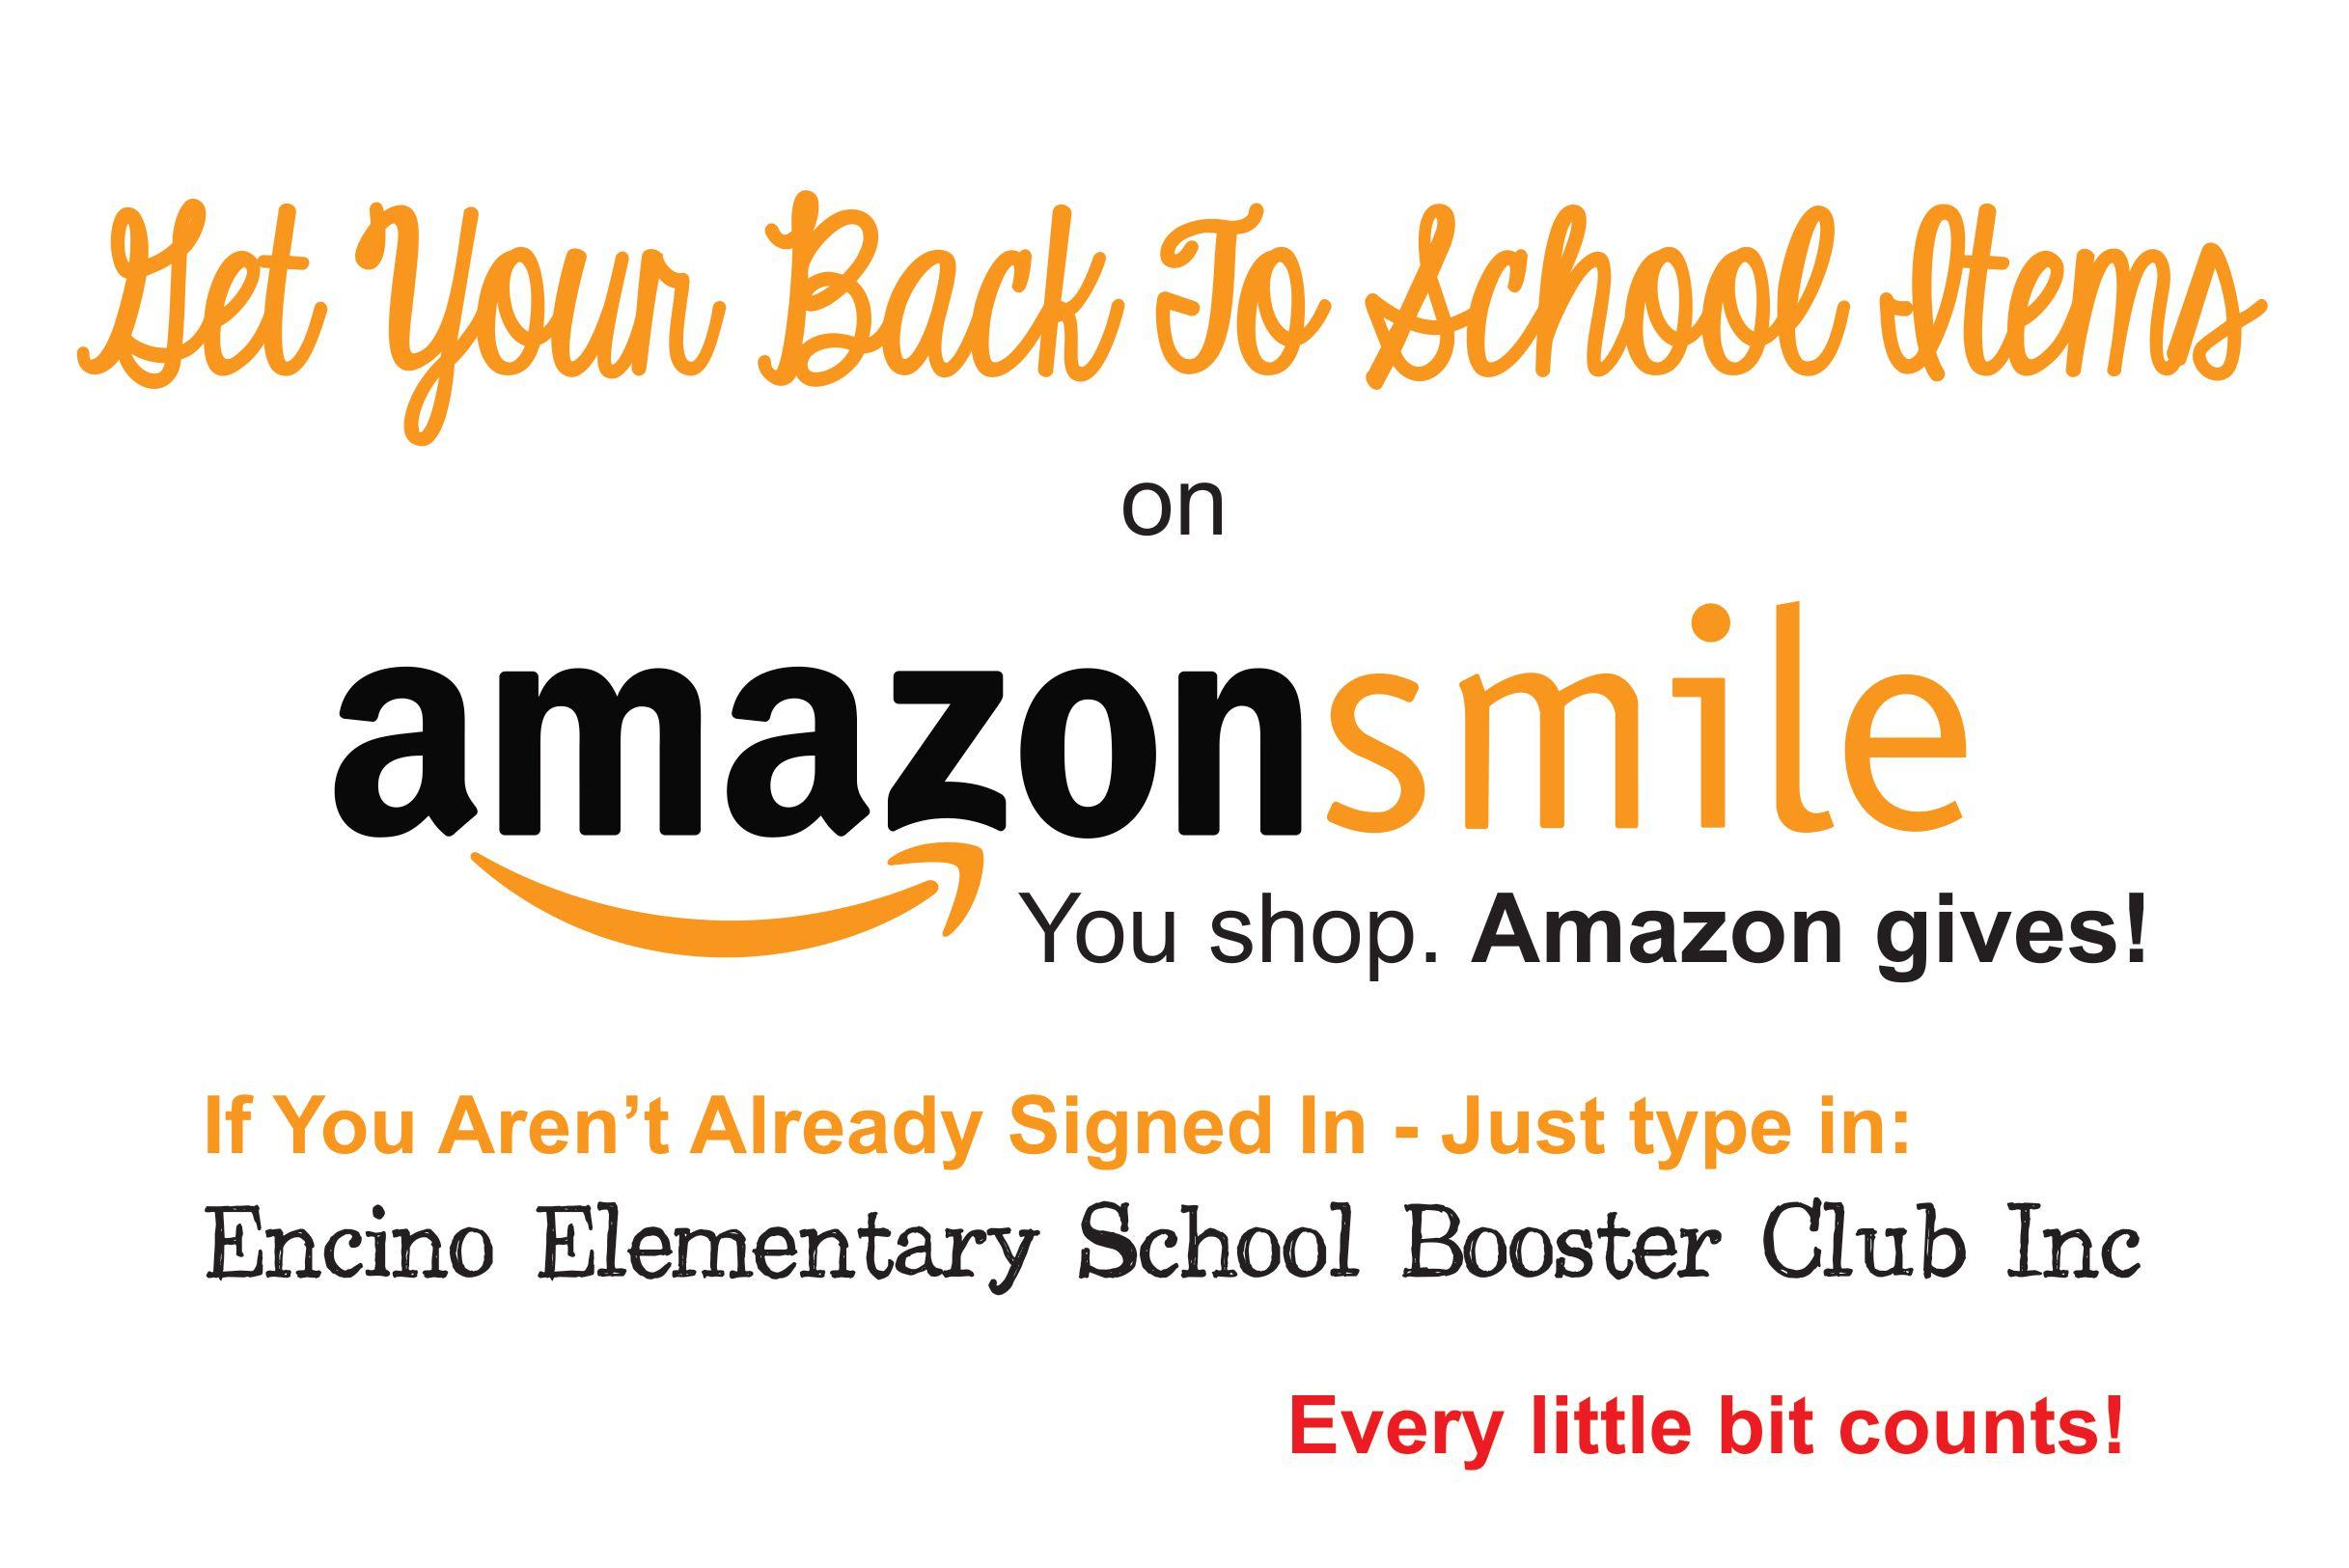 BUY BACK TO SCHOOL SUPPLIES THROUGH AMAZON SMILE